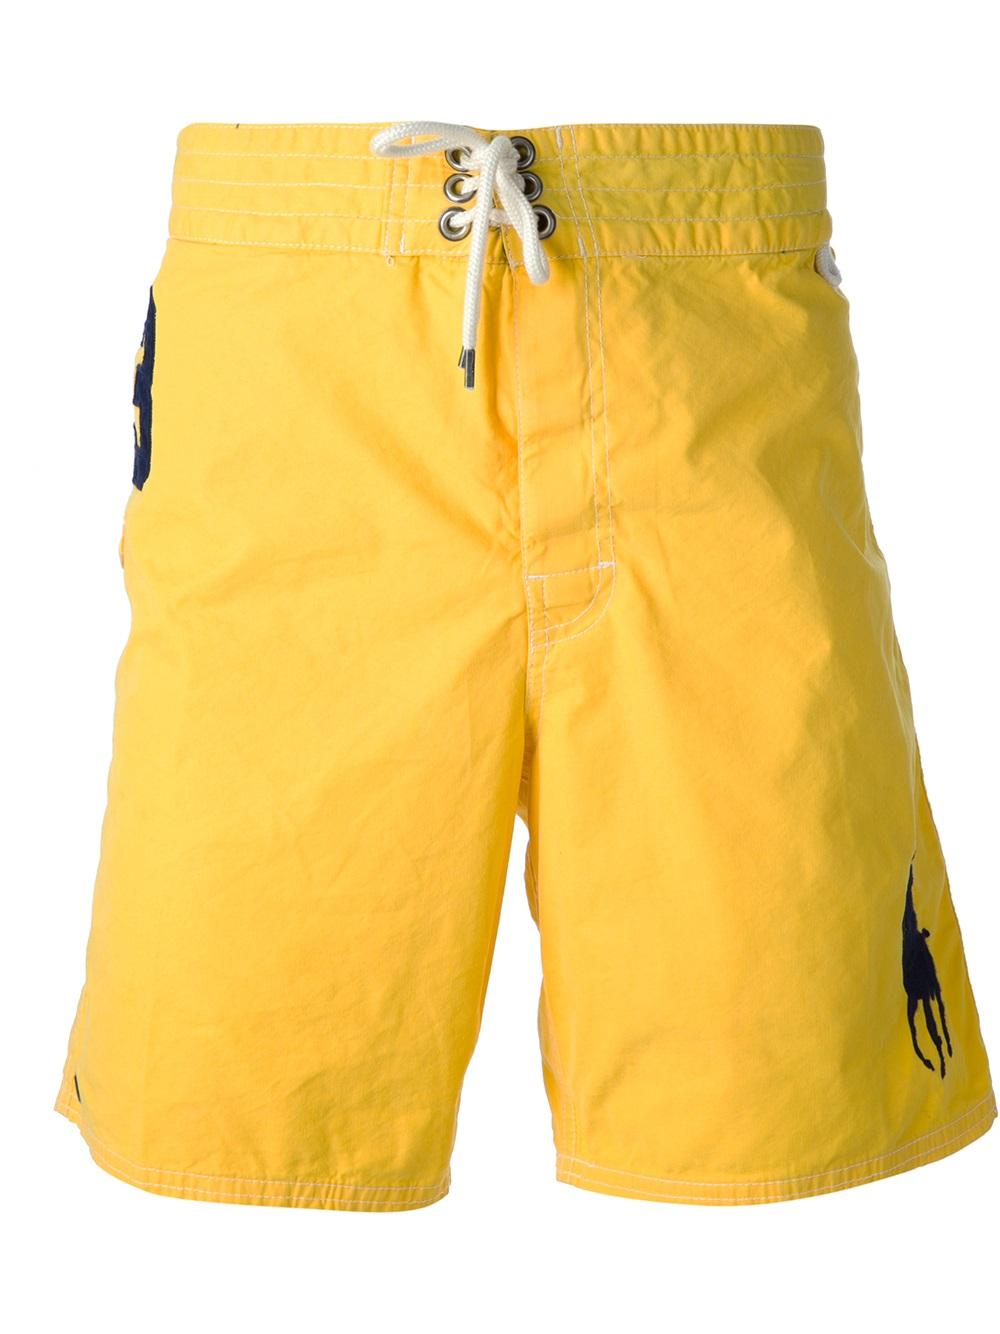 Lyst Polo Ralph Lauren Logo Bermuda Shorts In Yellow For Men